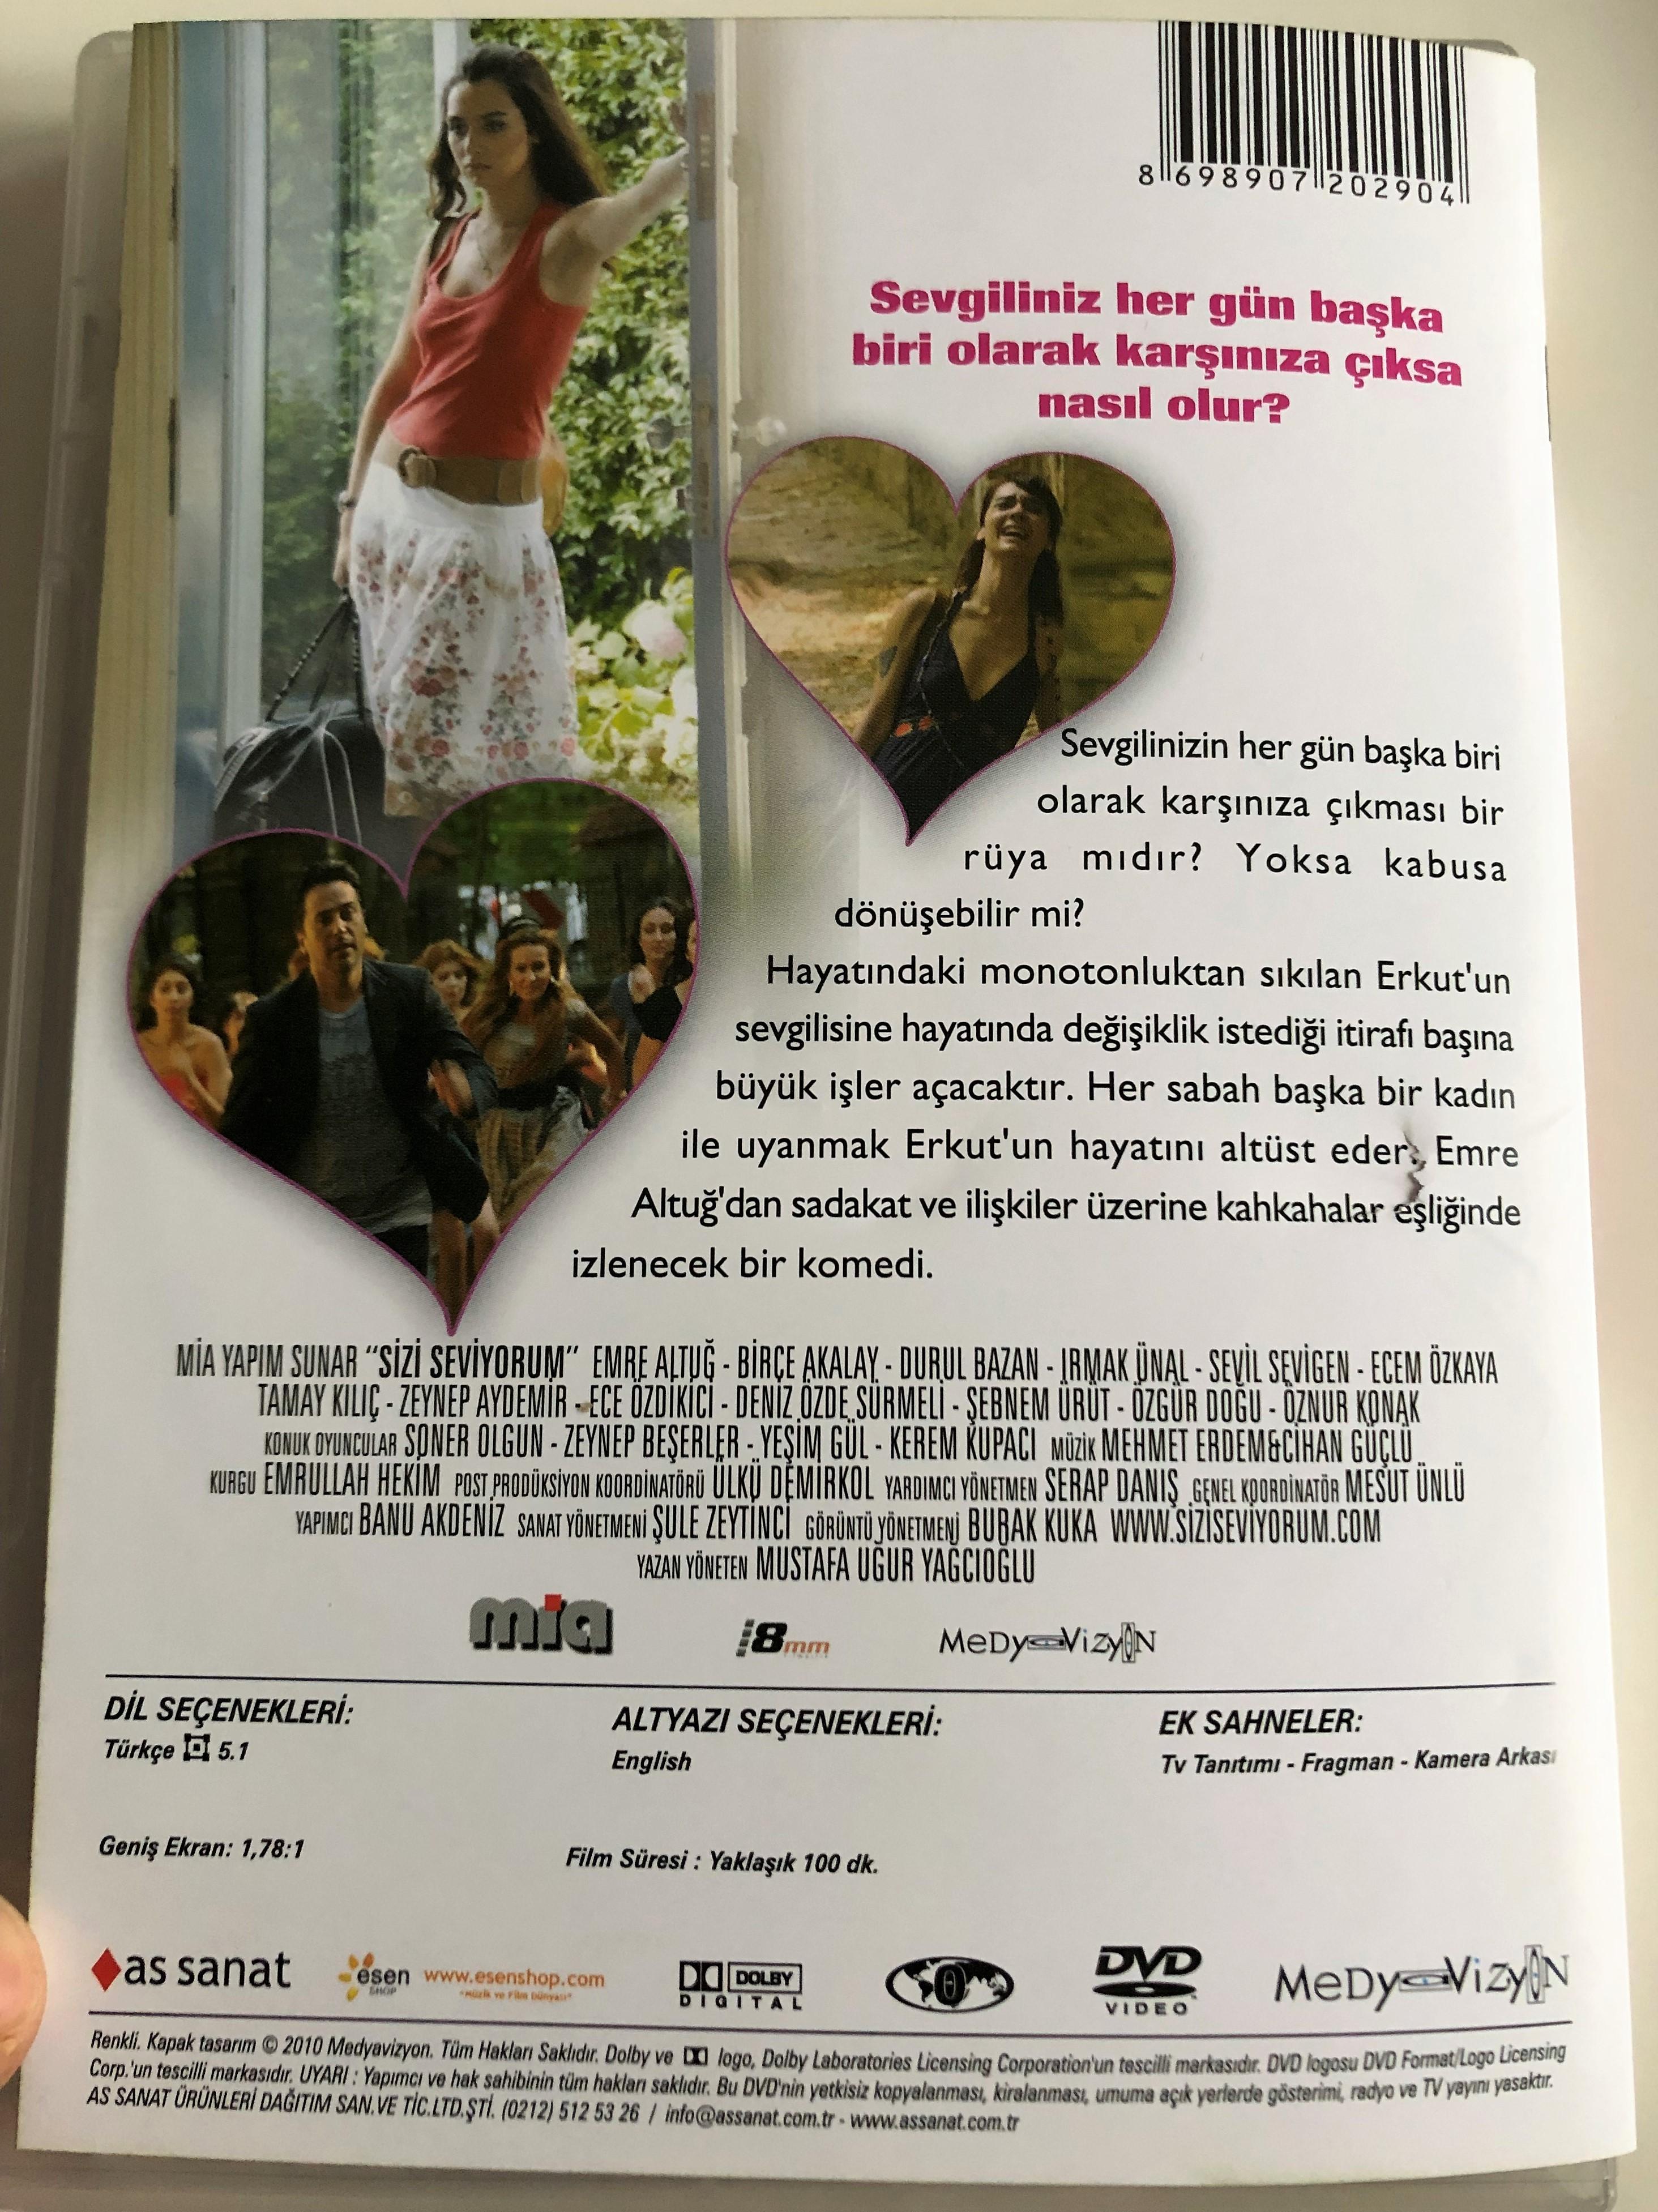 sizi-seviyorum-dvd-2009-directed-by-mustafa-u-ur-ya-c-o-lu-starring-emre-altu-birce-akalay-2-.jpg